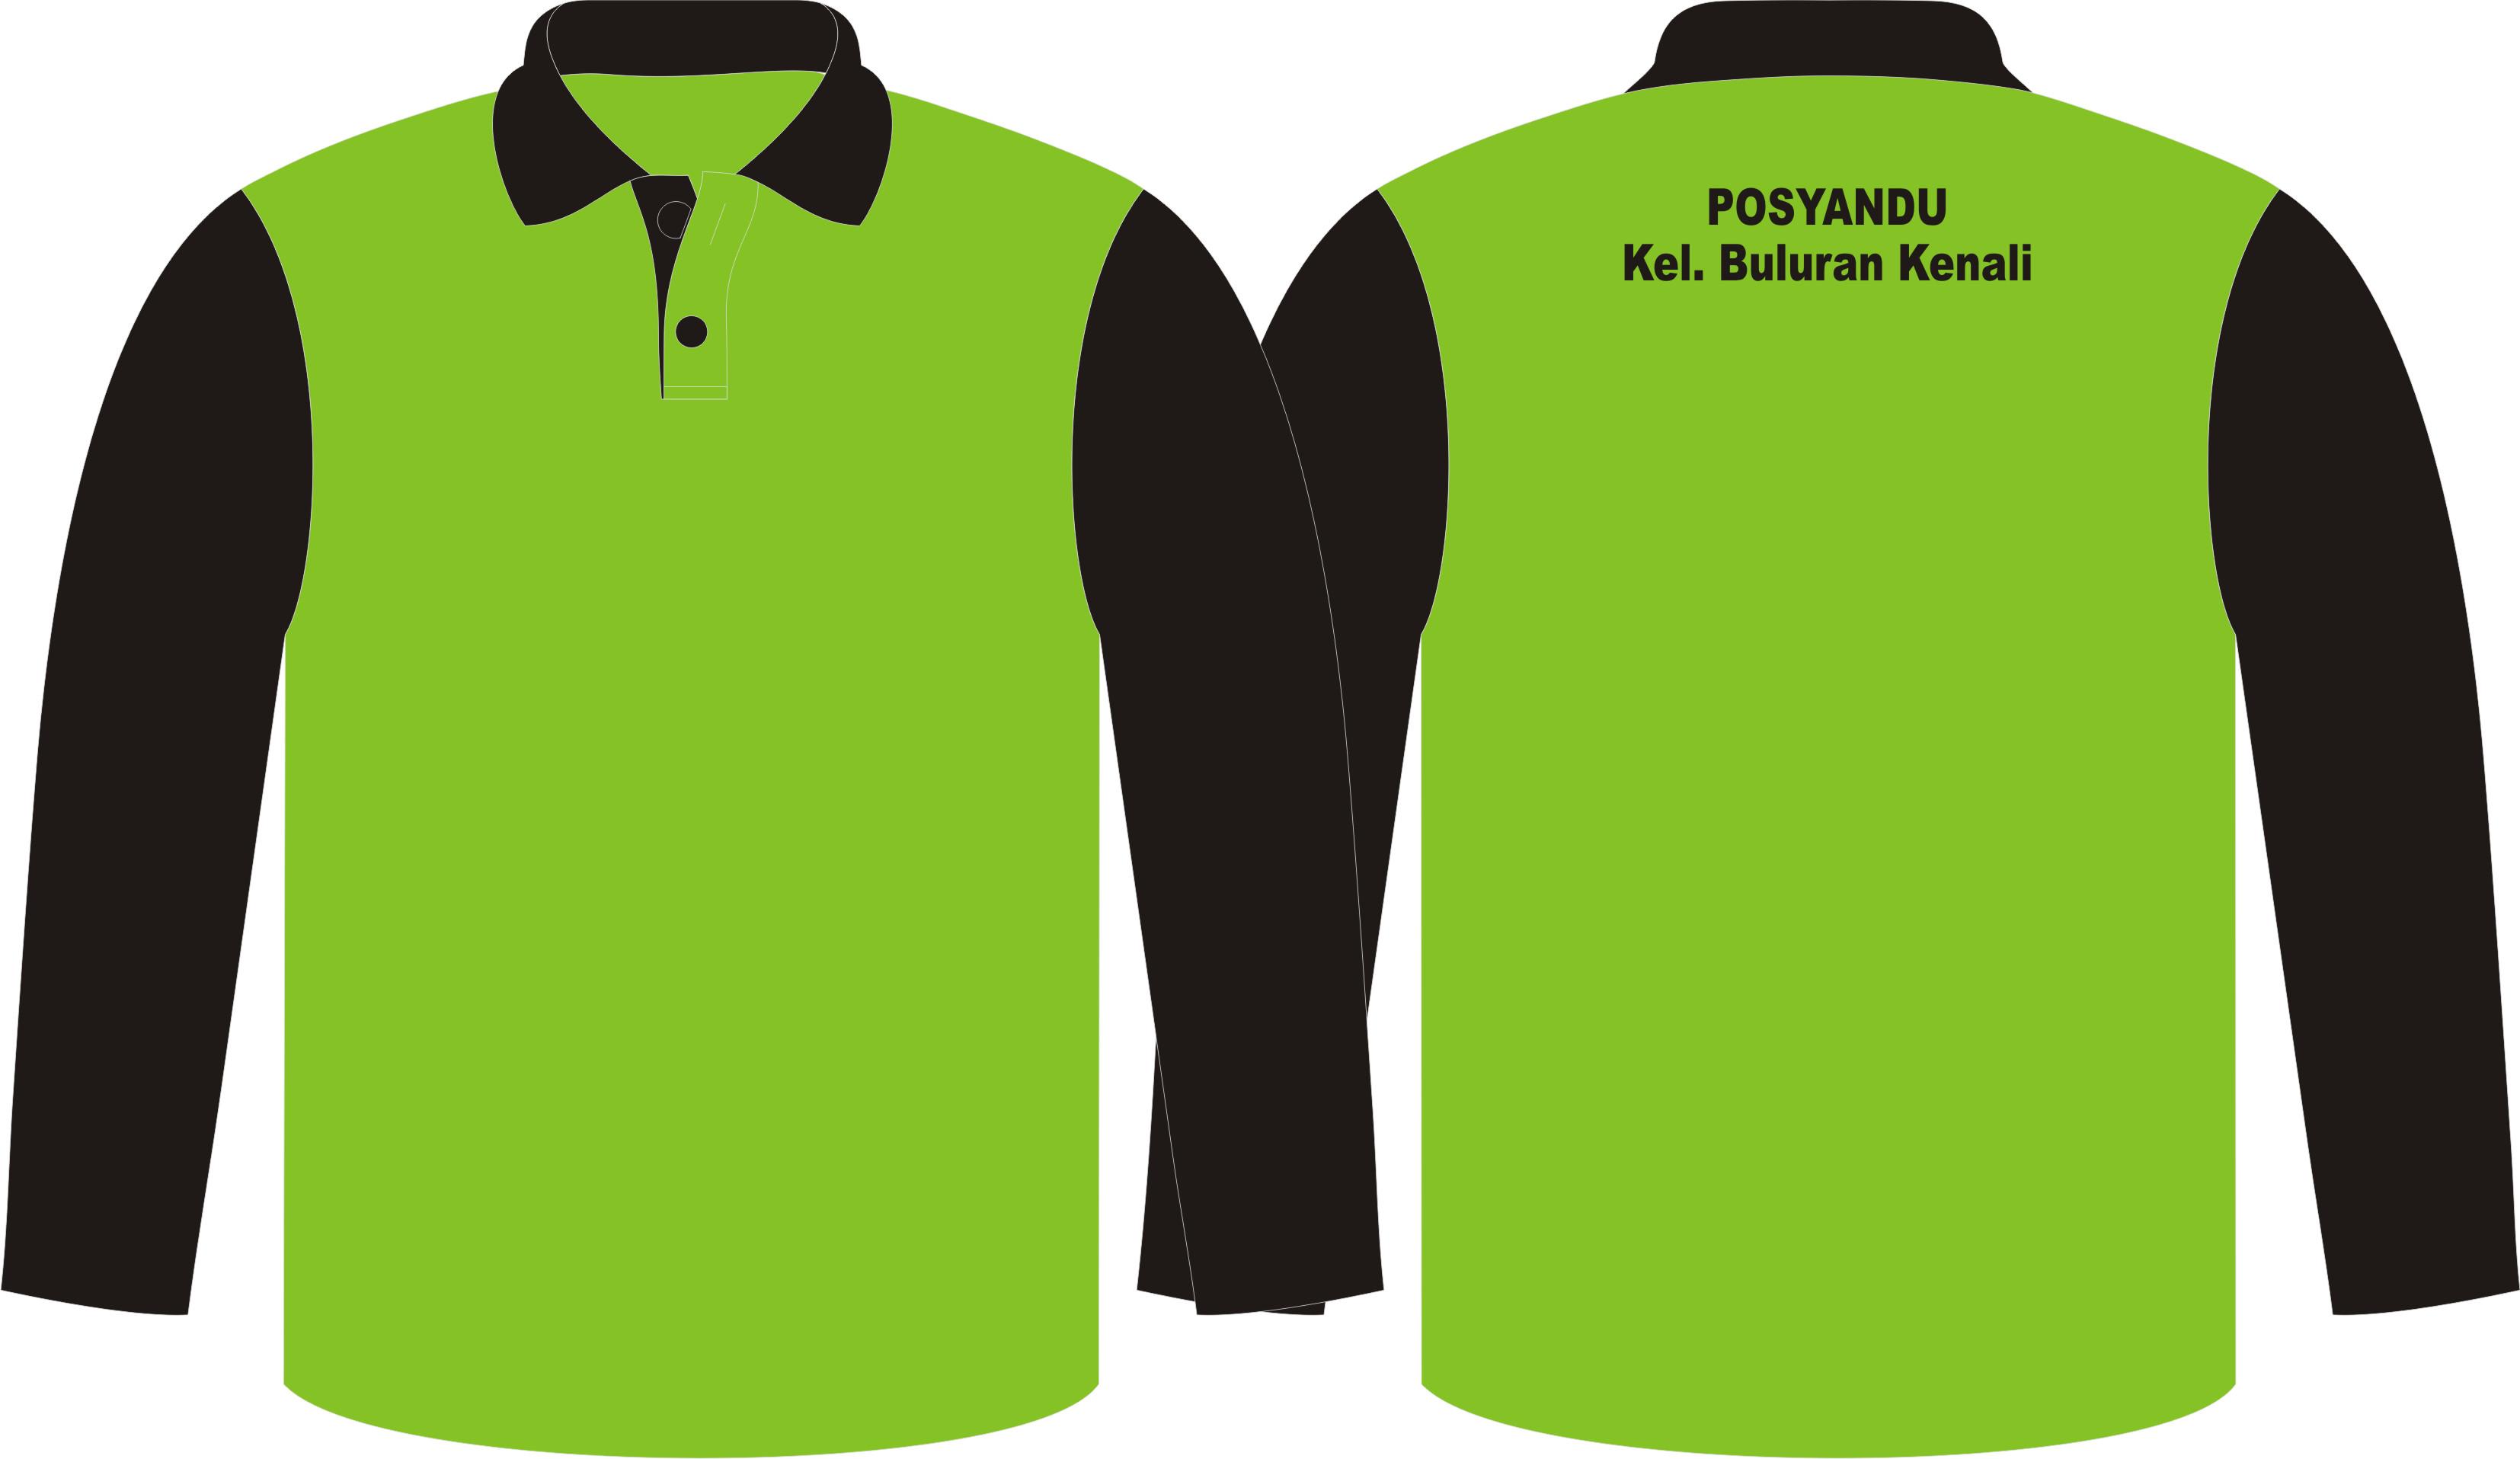 Seragam Posyandu, Poloshirt & Training